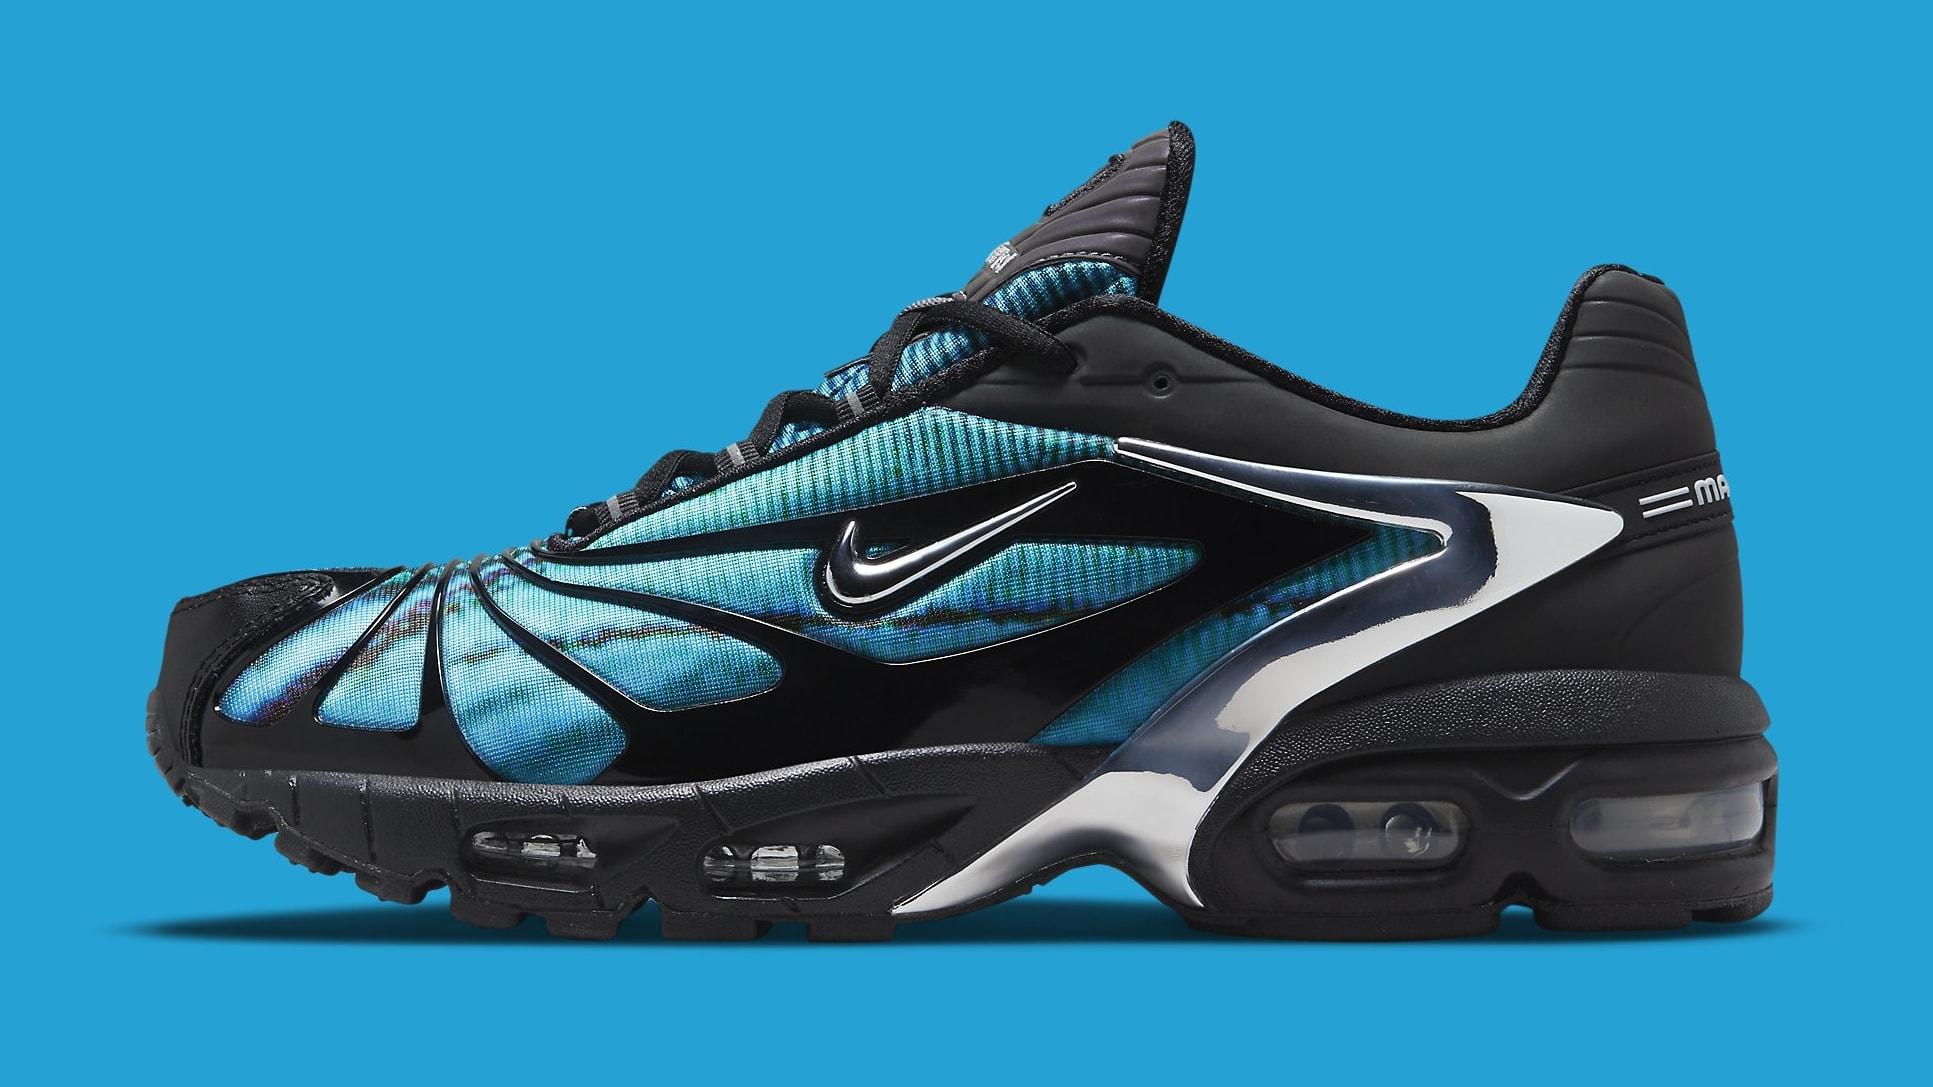 Skepta x Nike Air Tailwind V 'Blue' CQ8714-001 Lateral